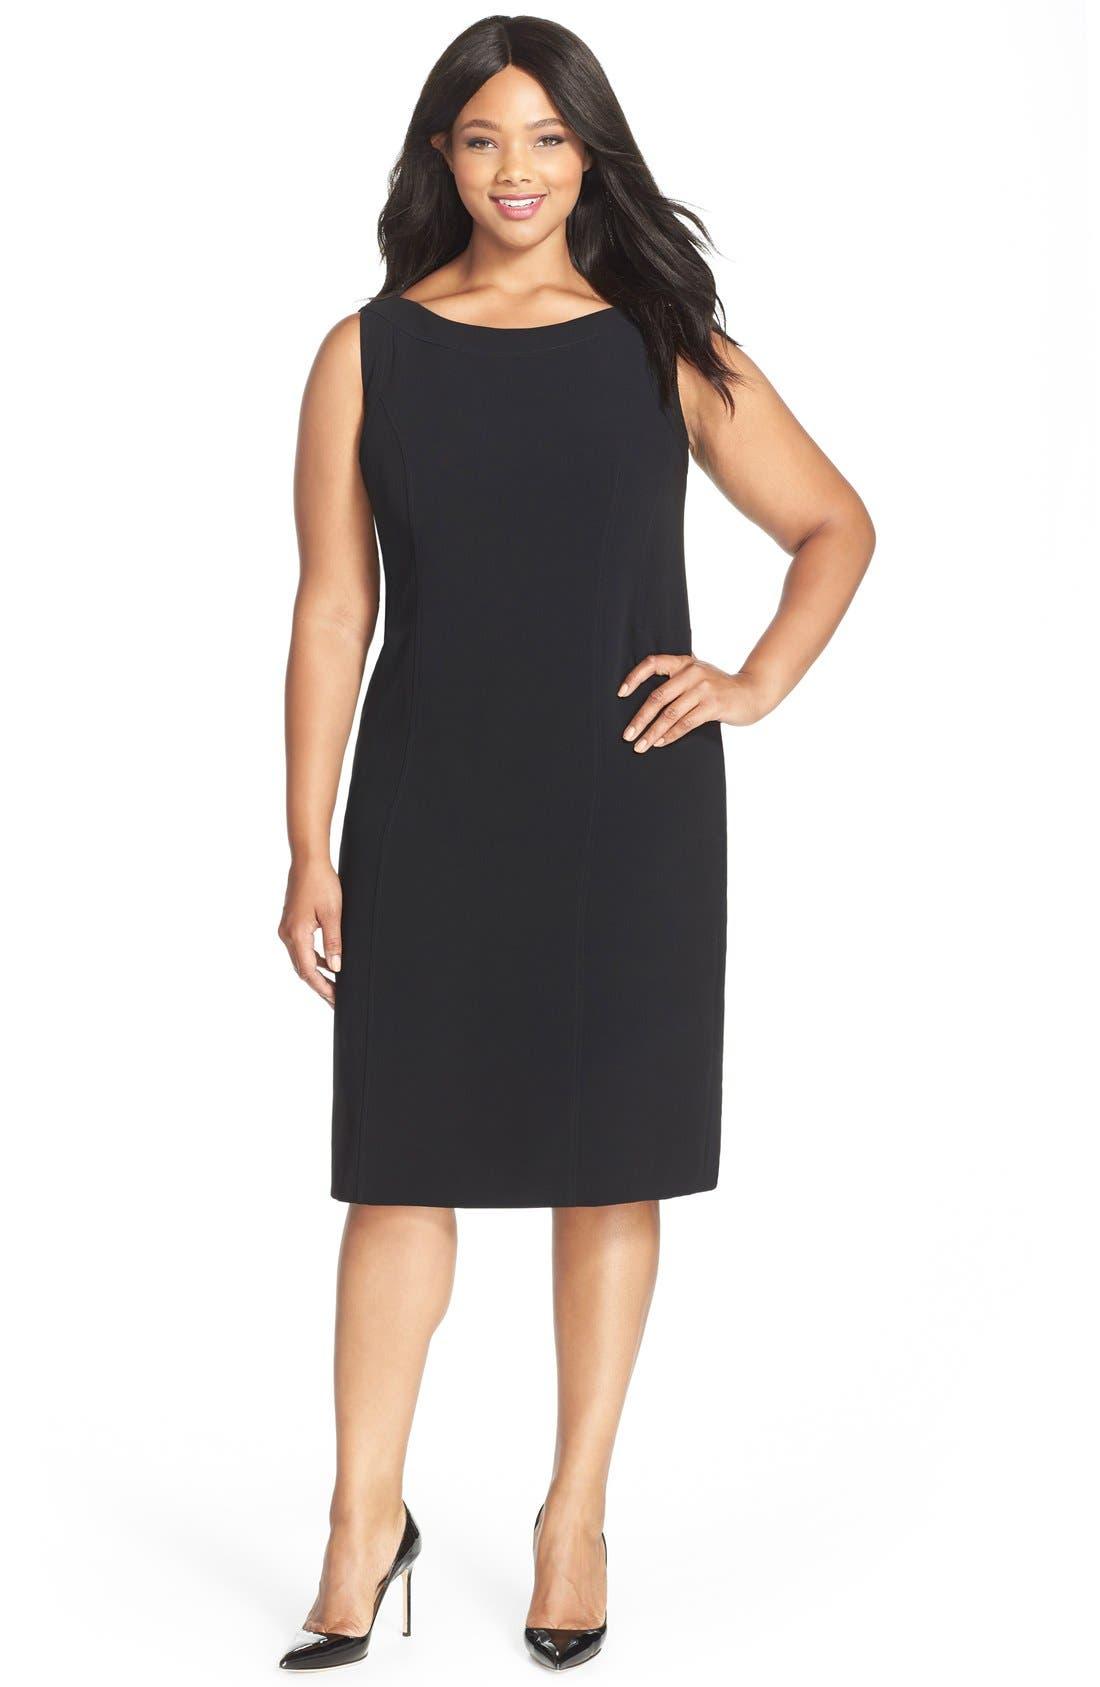 Alternate Image 1 Selected - Louben Sleeveless Suiting Sheath Dress (Plus Size)